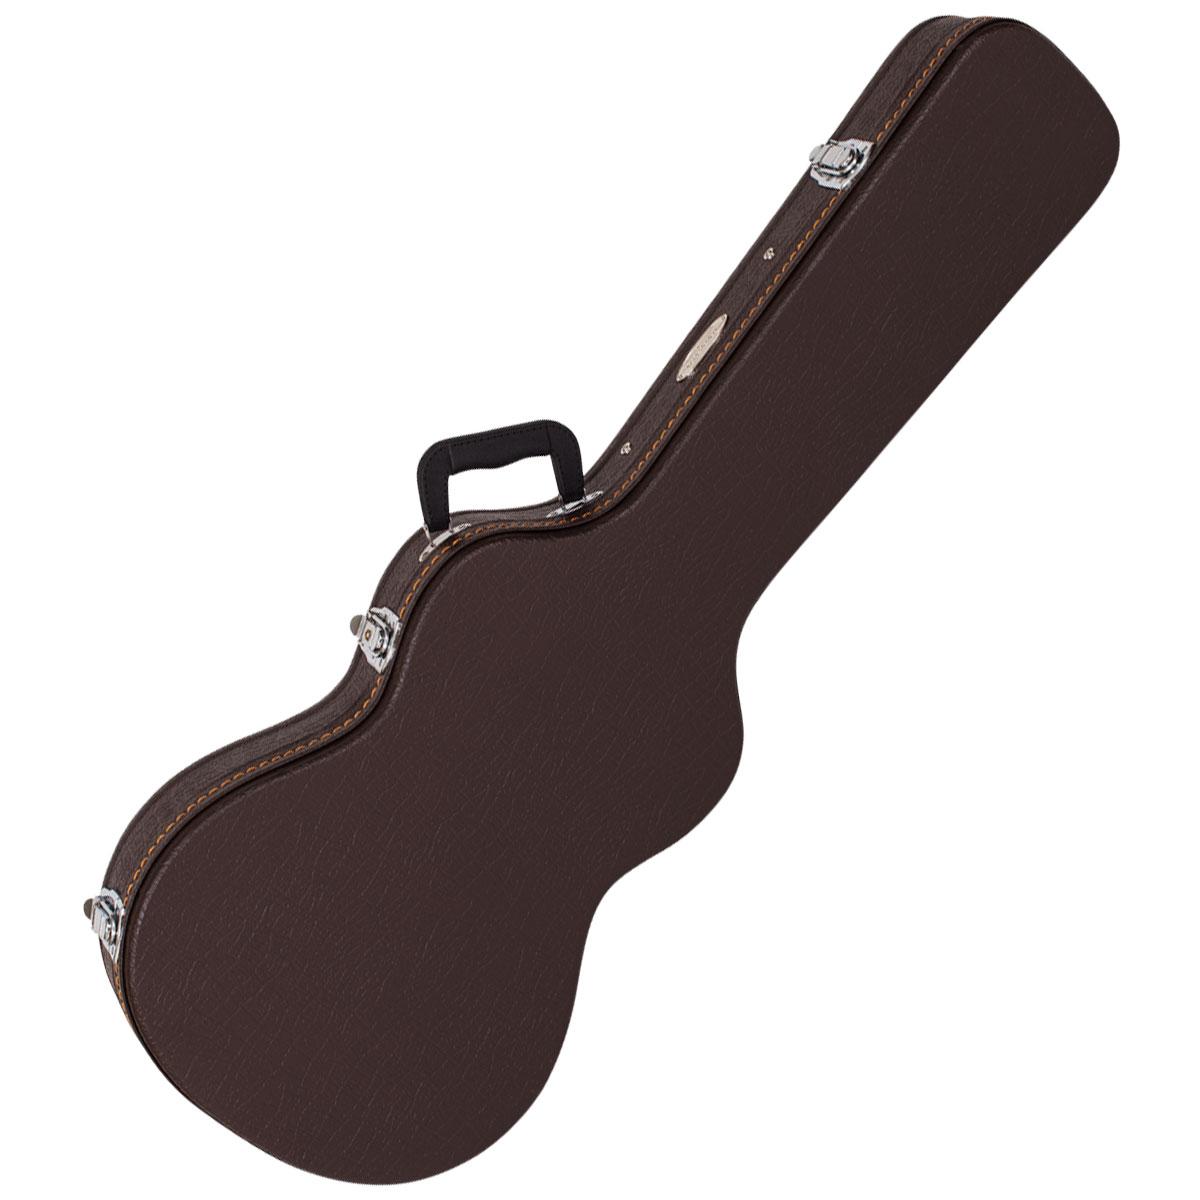 Hard Case Luxo p/ Guitarra Les Paul - VCGLLP Vogga